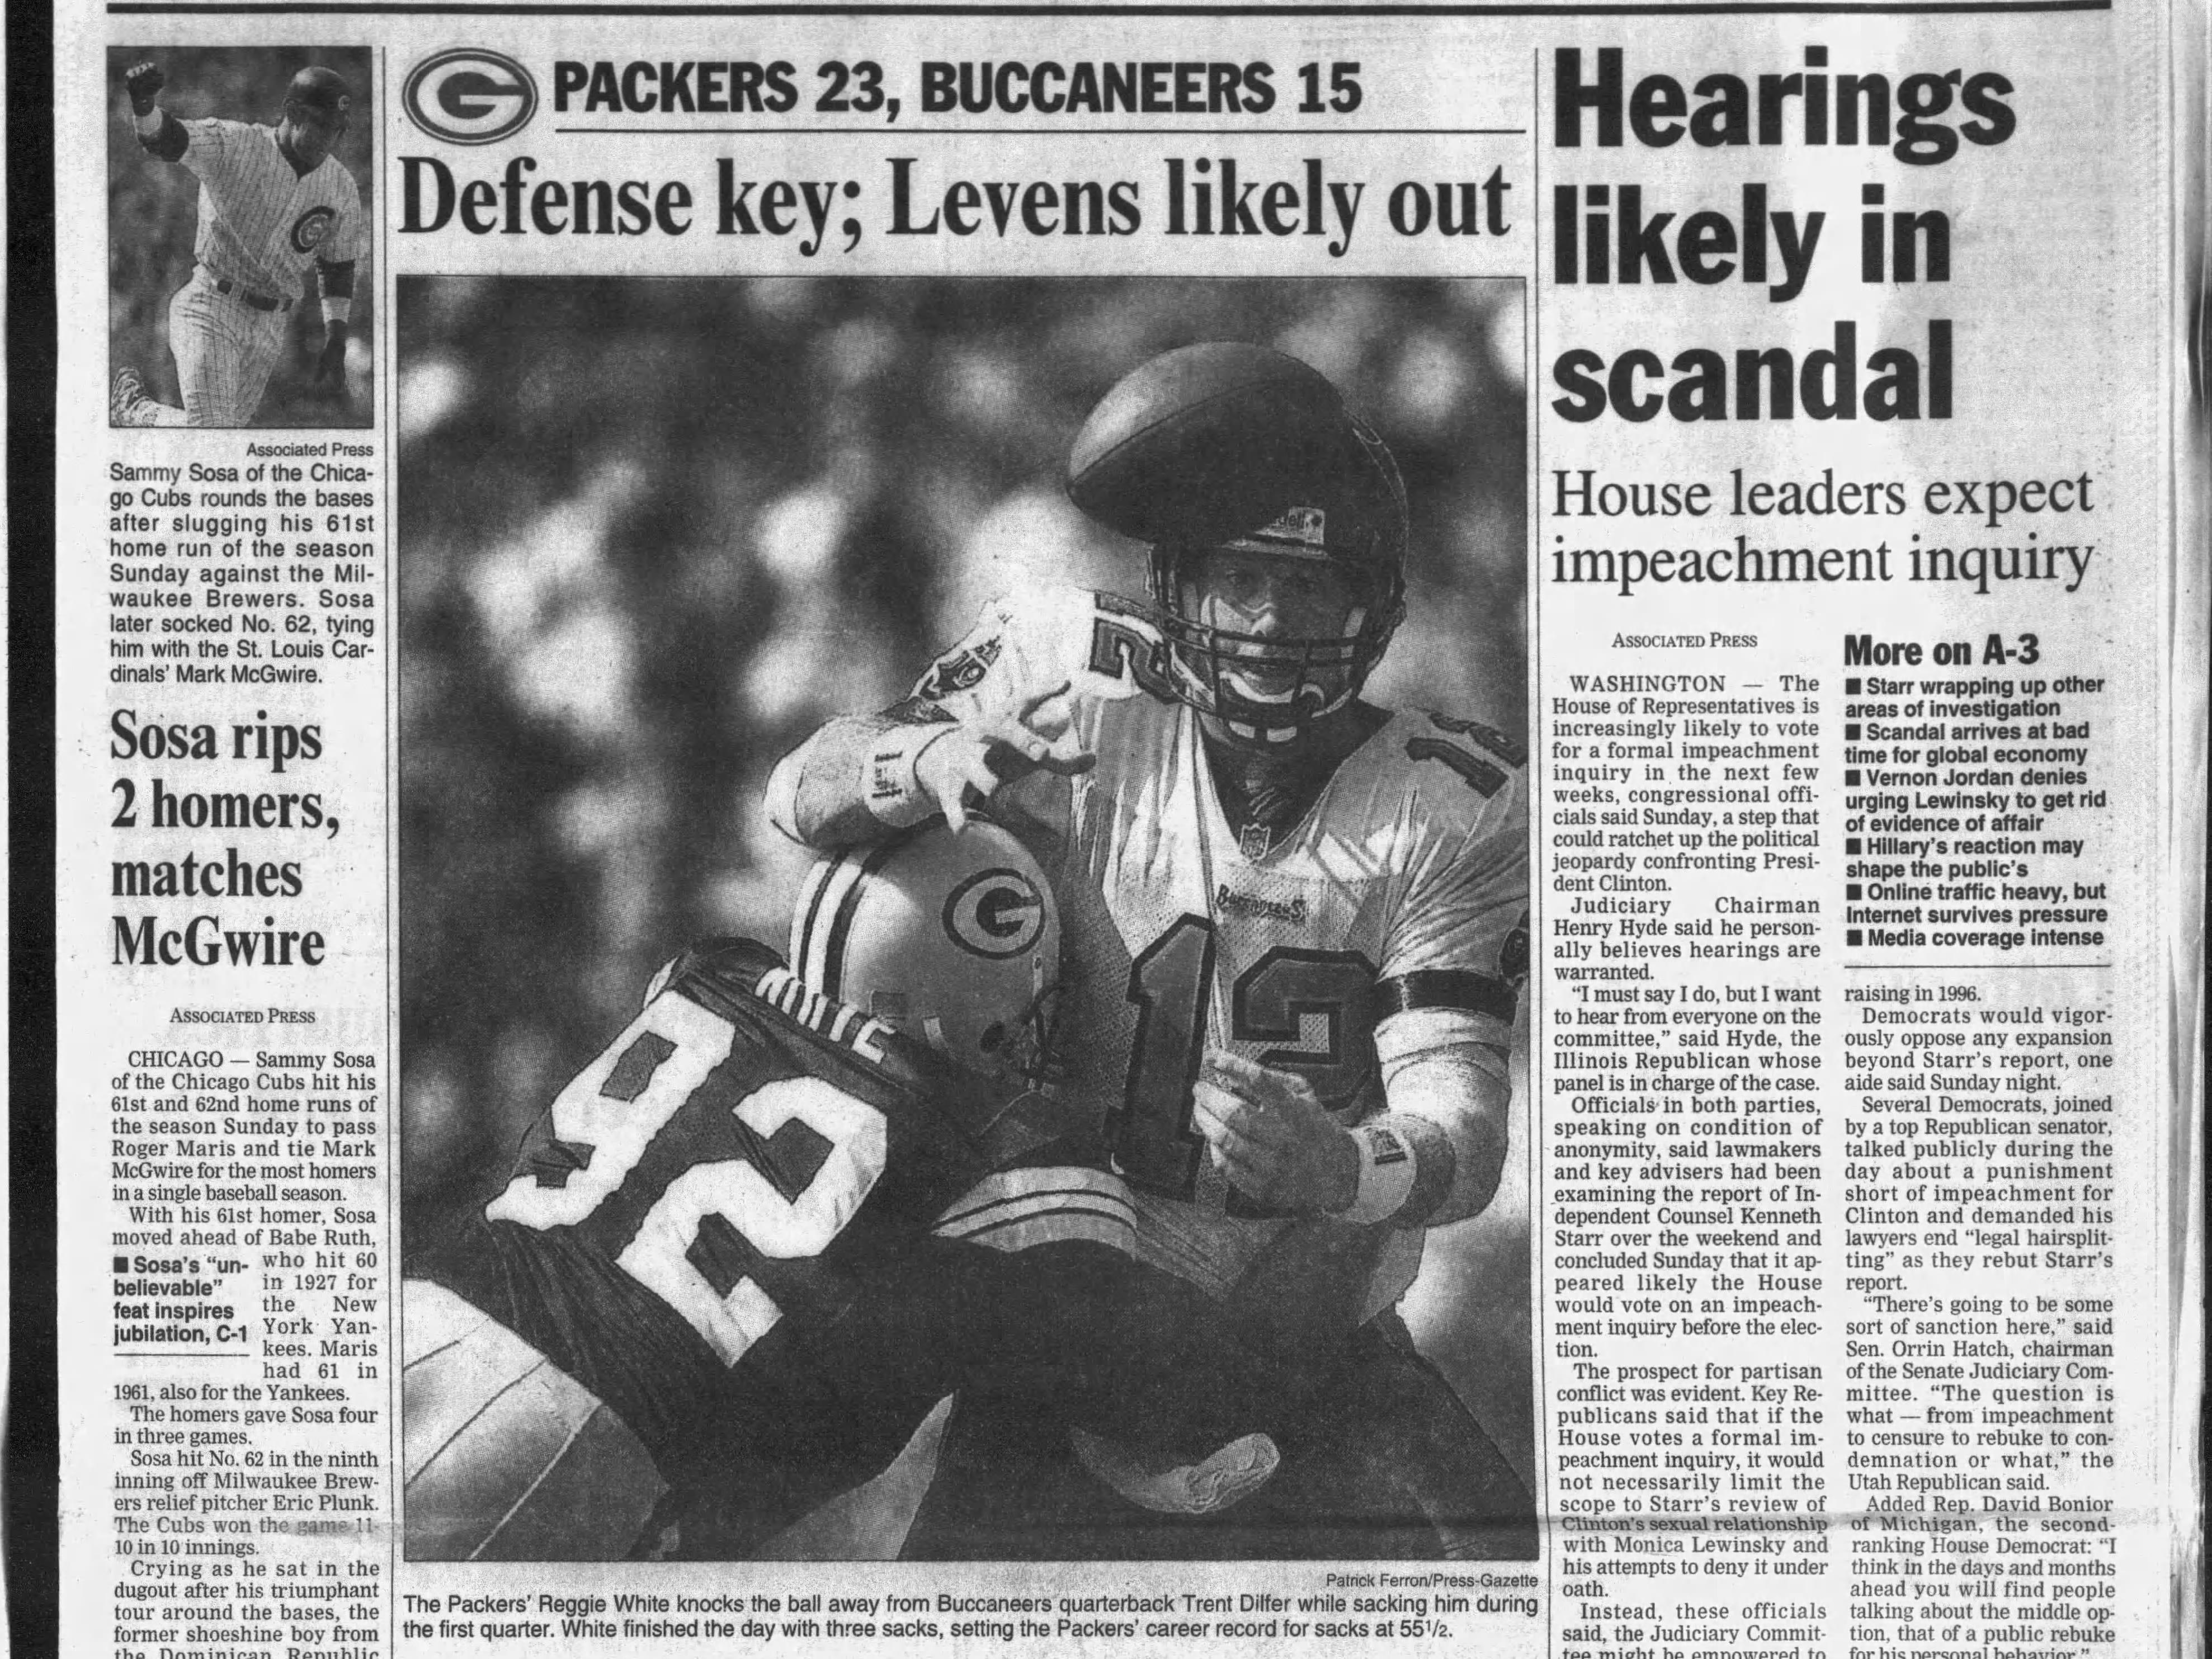 Sept. 14, 1998